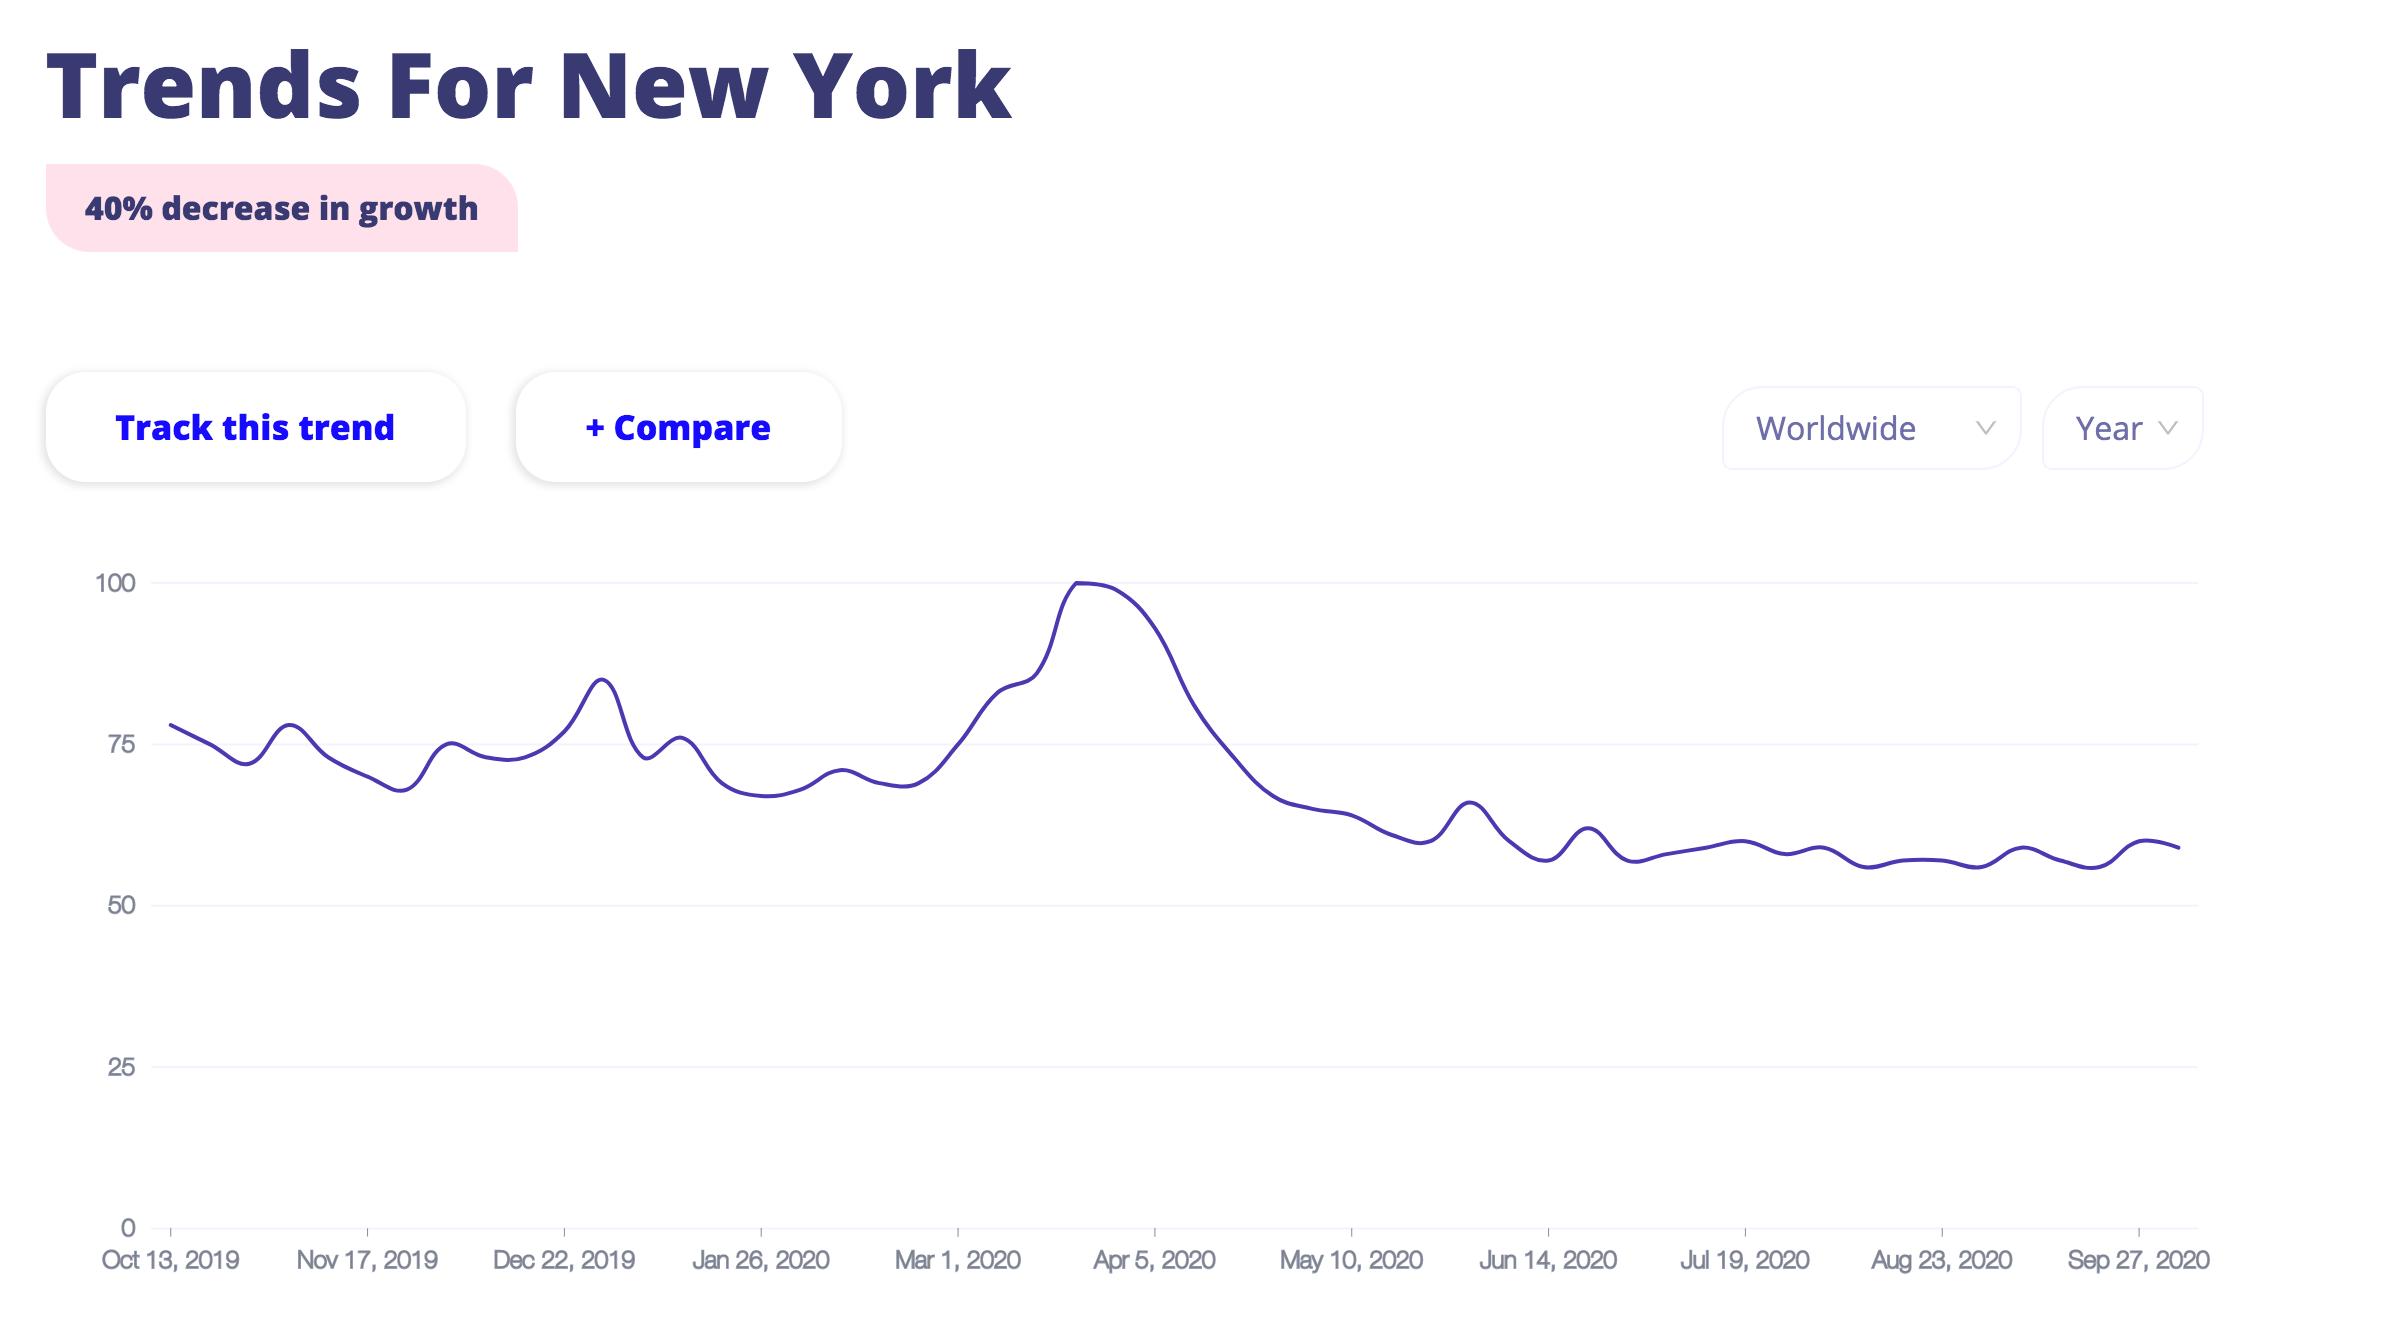 New York on Trends Everywhere